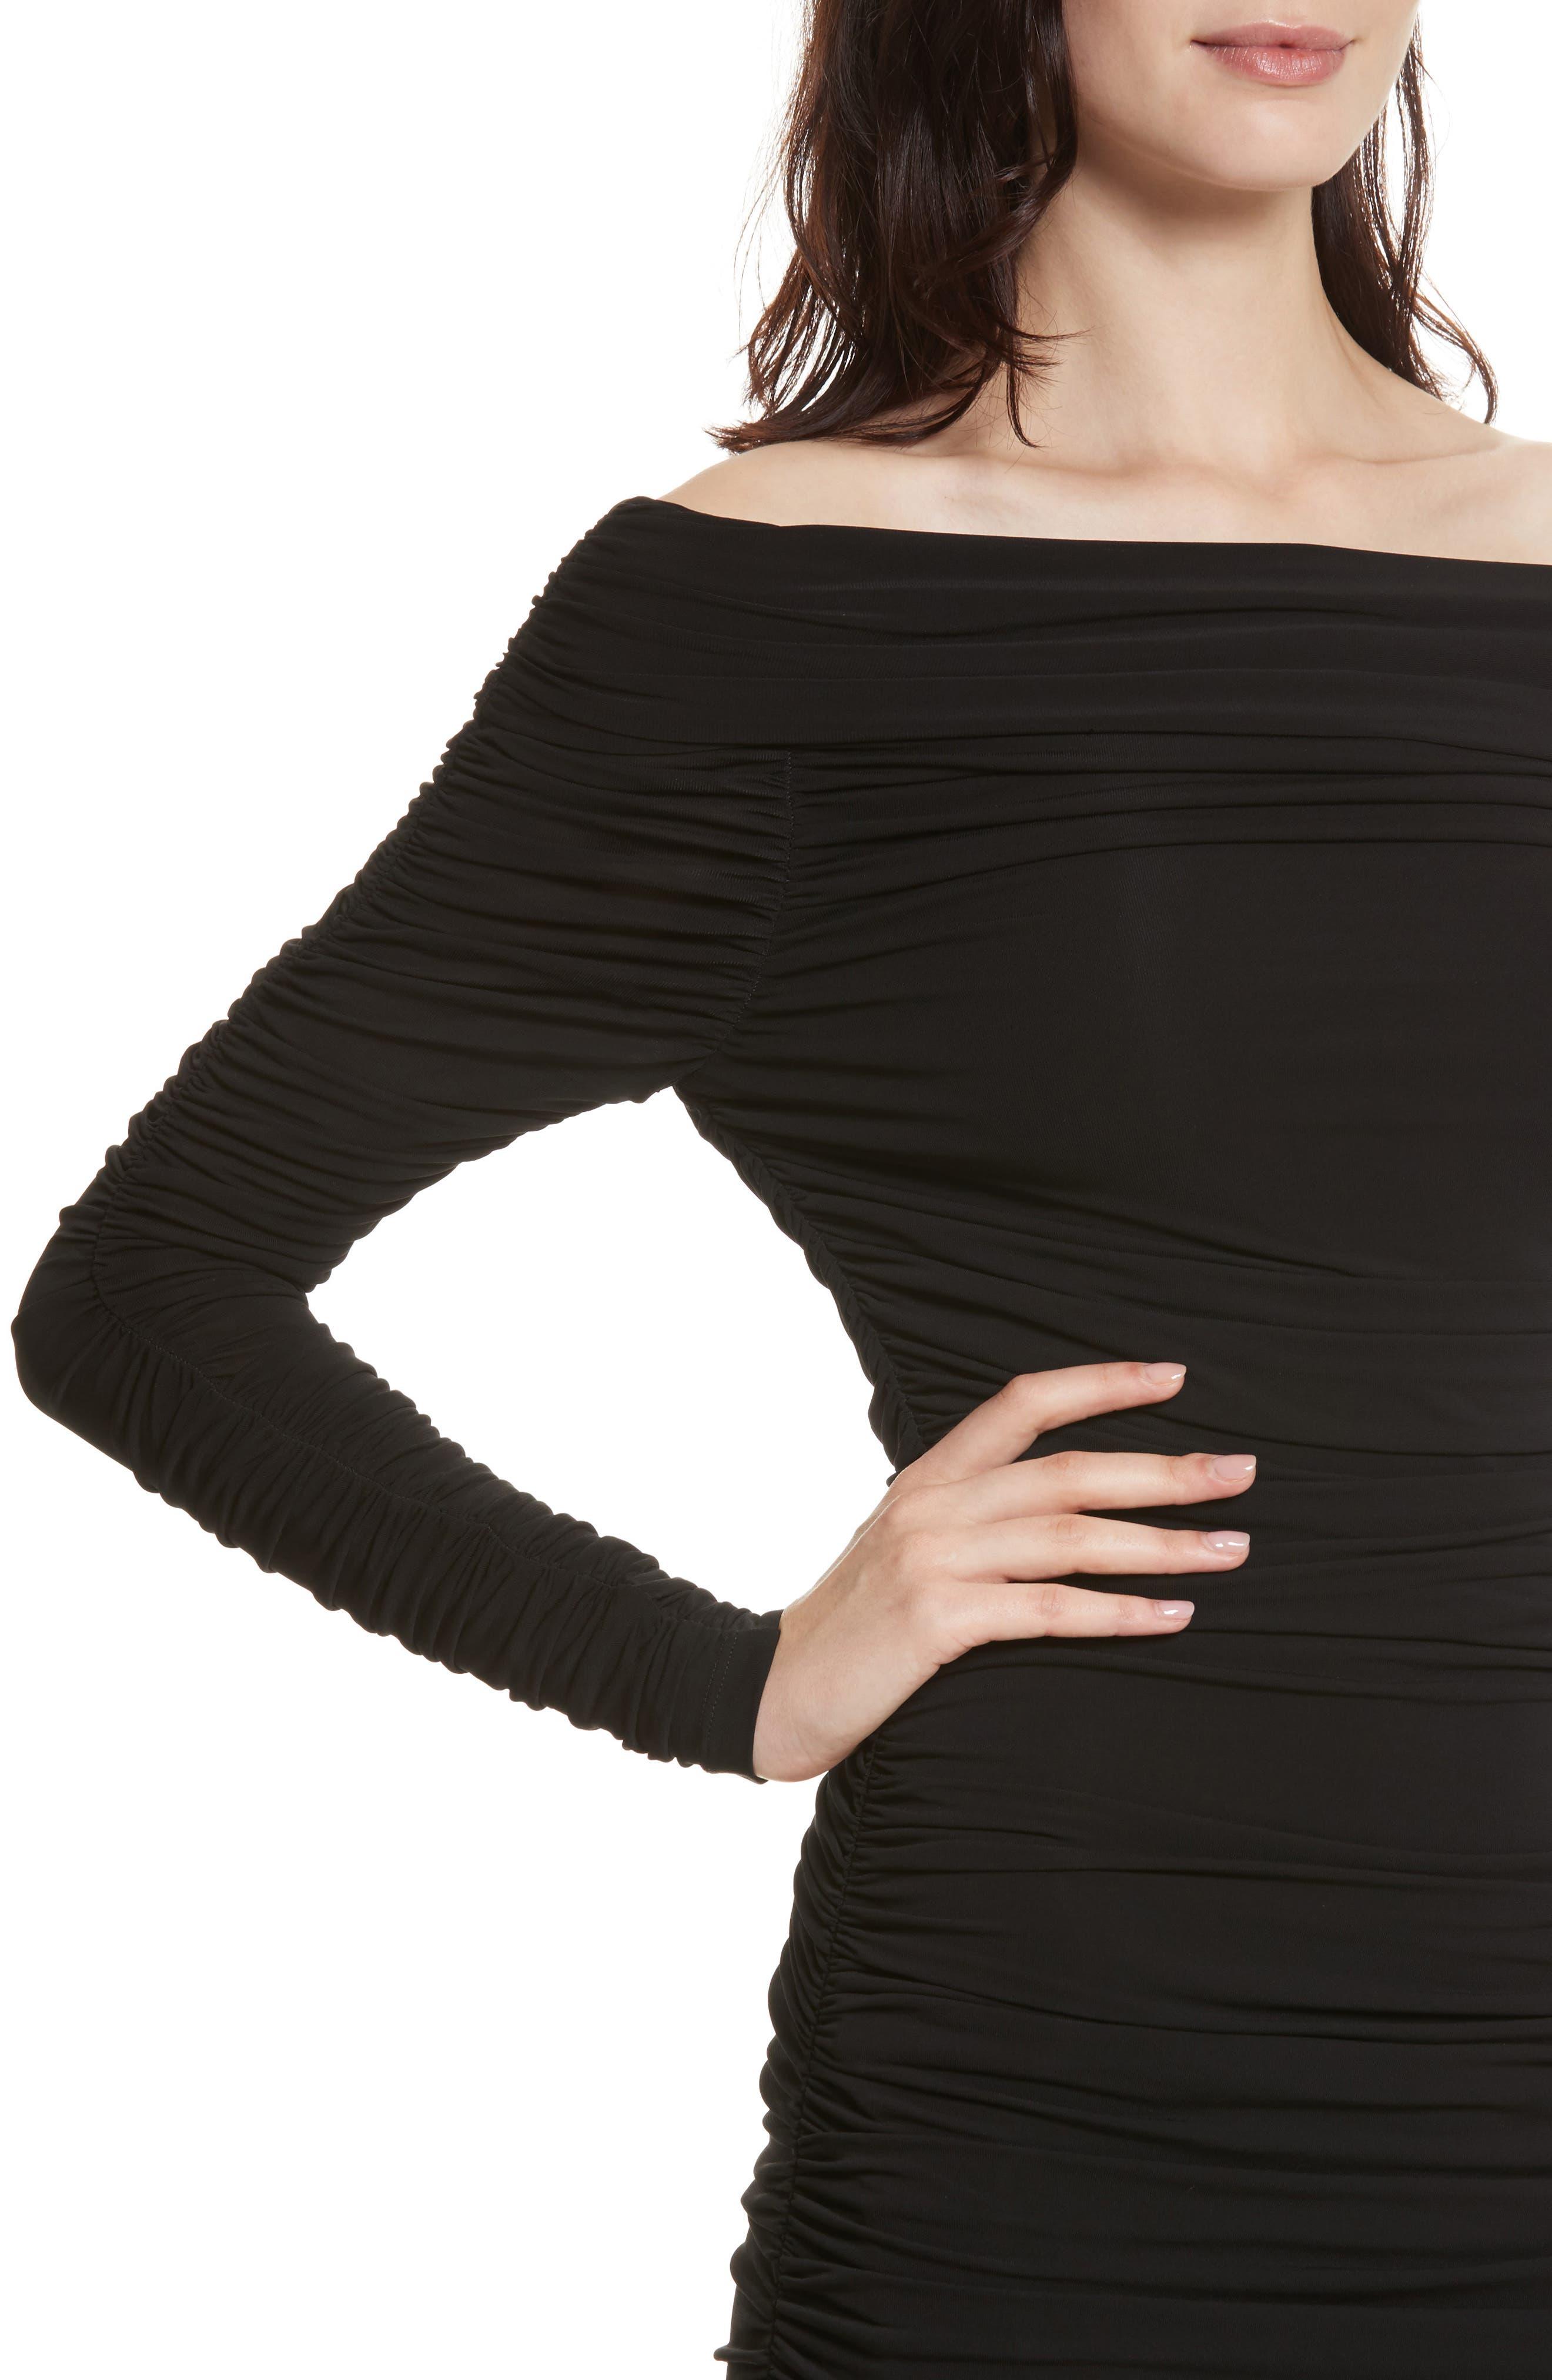 Blaise Off the Shoulder Ruched Dress,                             Alternate thumbnail 4, color,                             Black